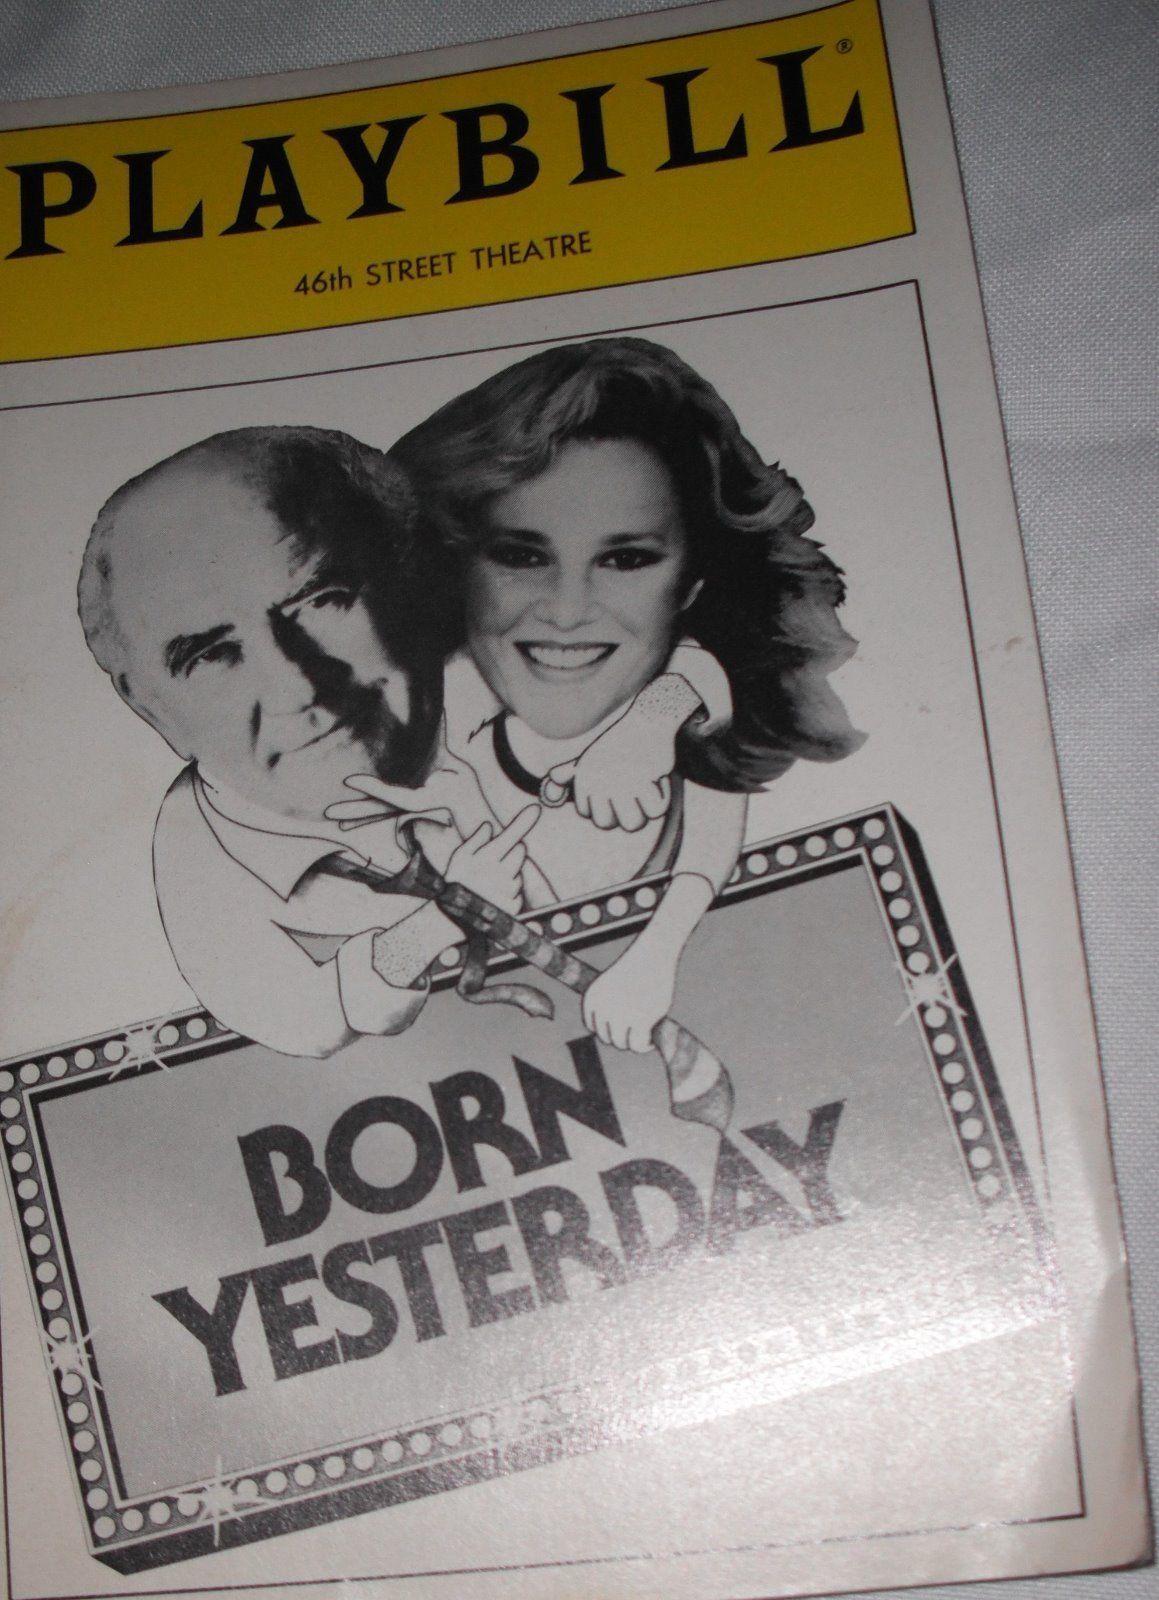 Born Yesterday Playbill